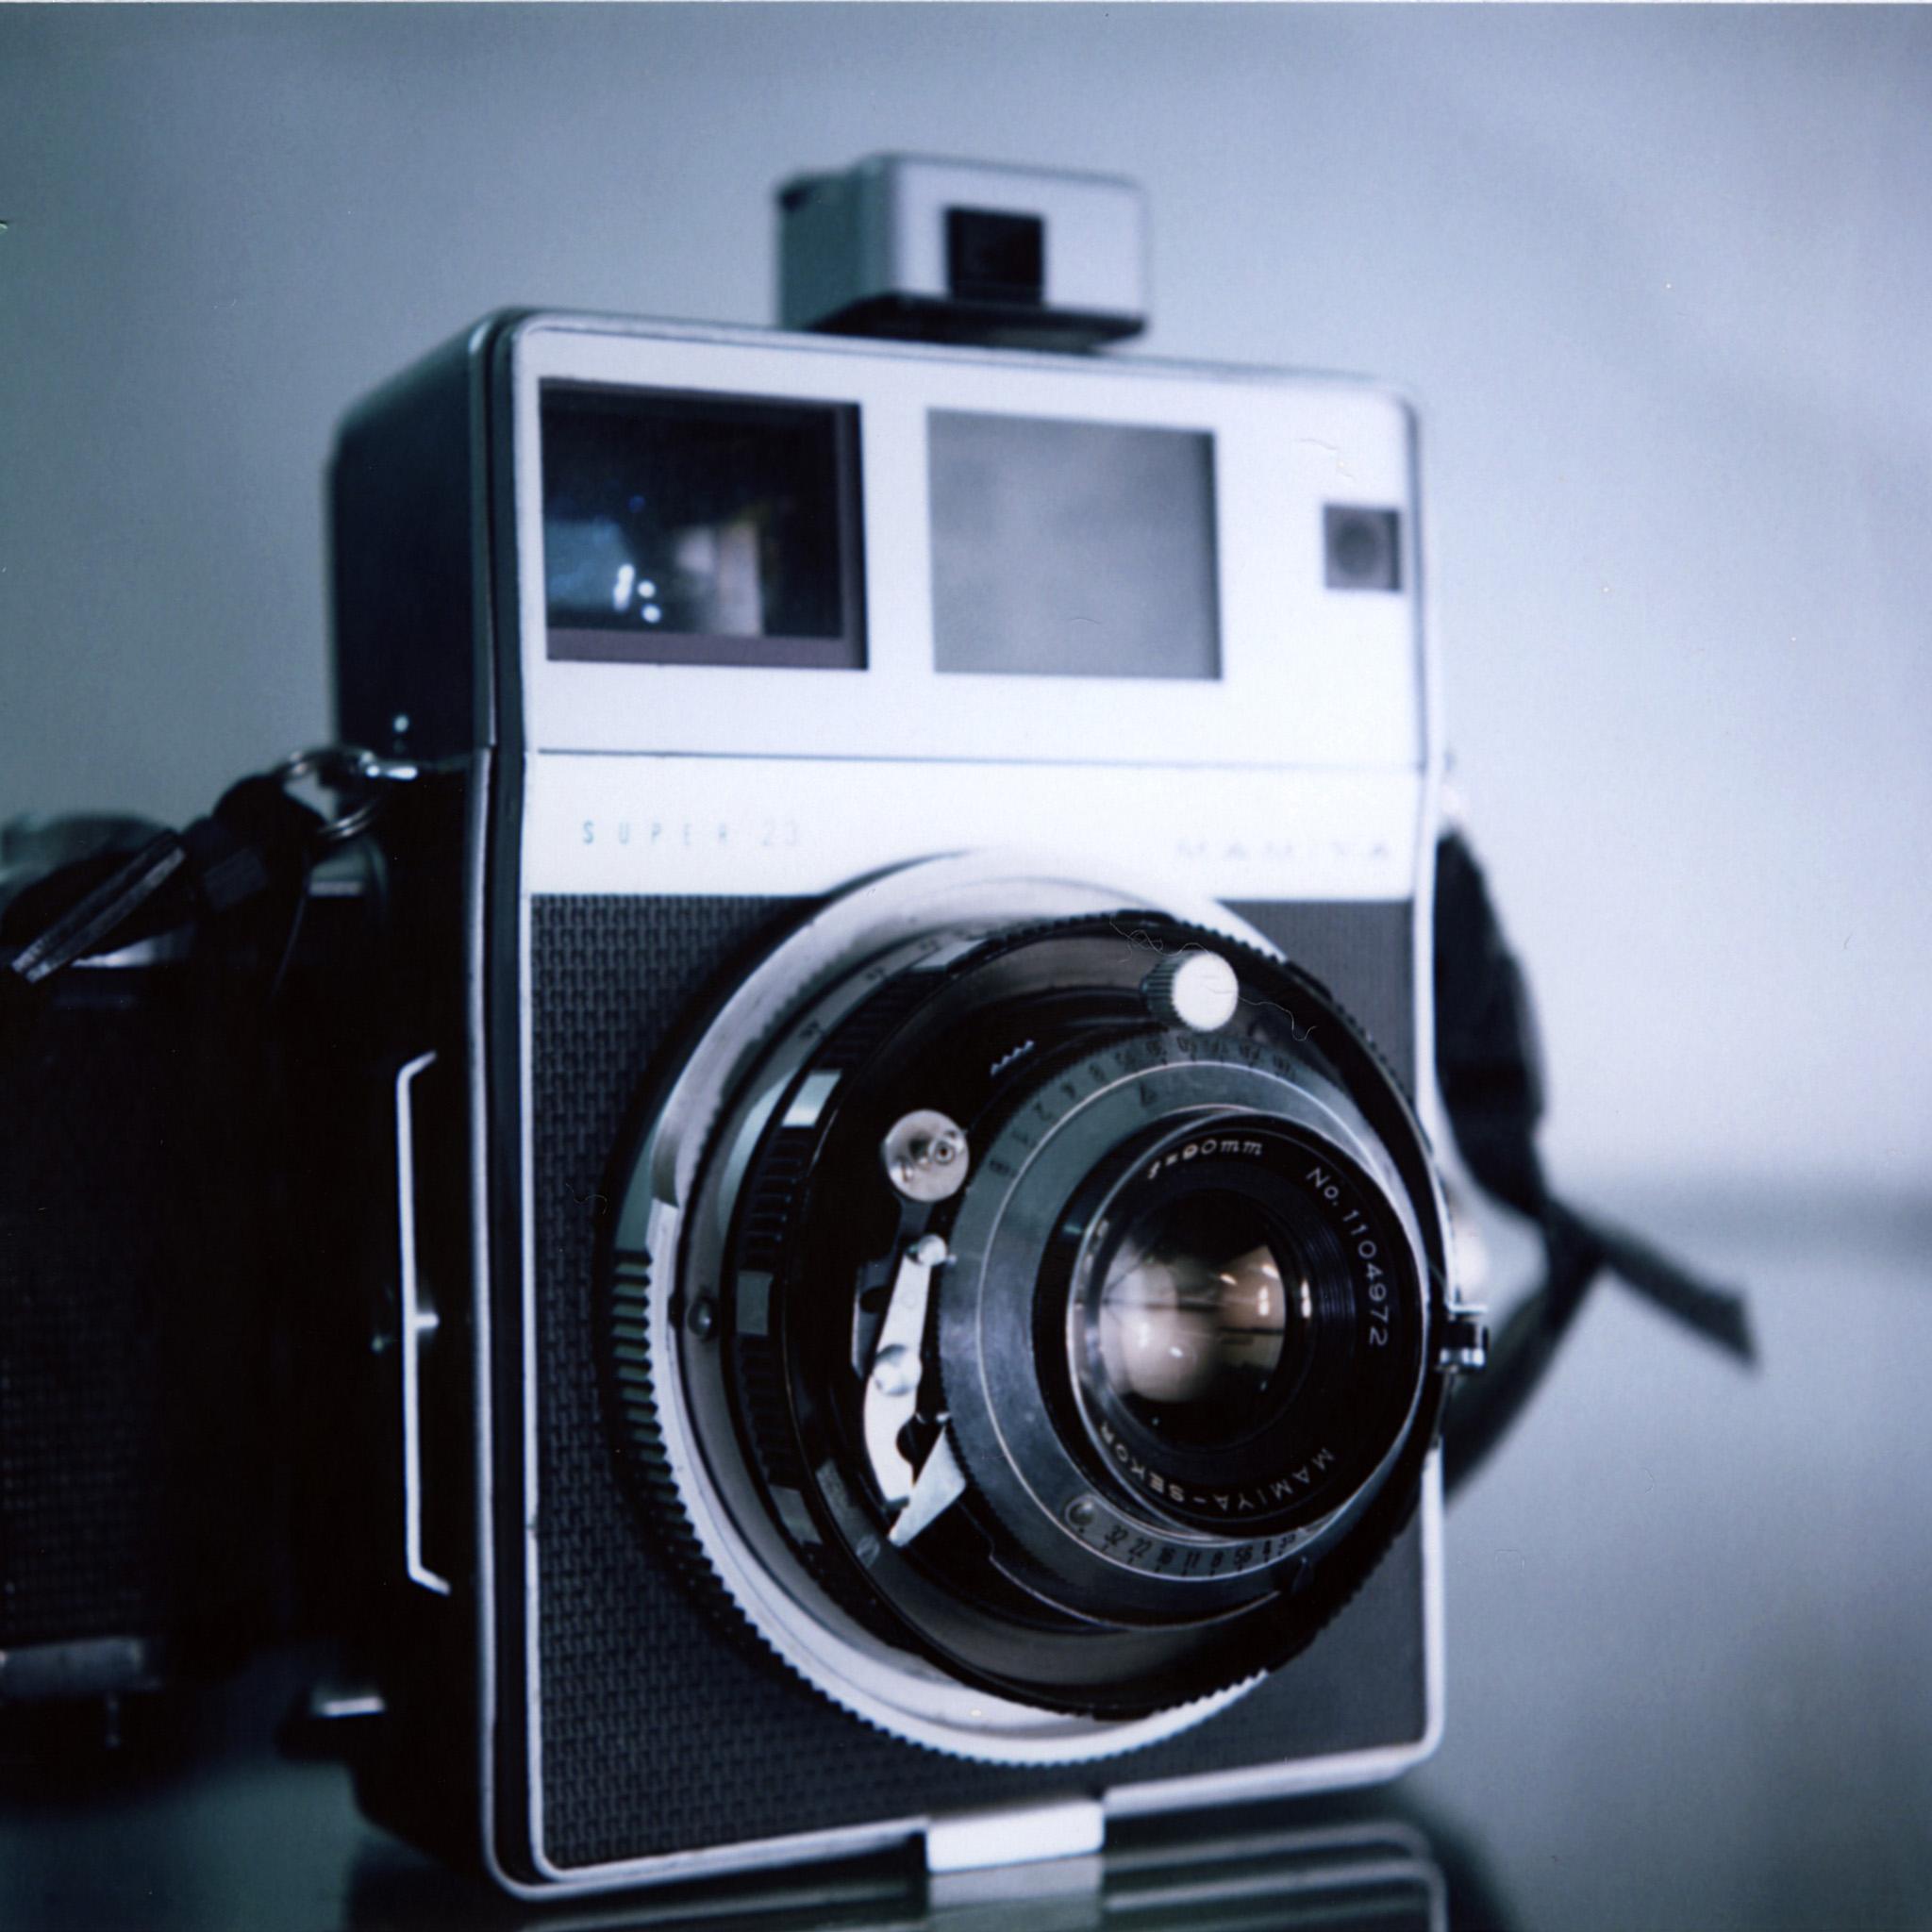 dsevilla - mamiya super 23 camera ipad wallpaper